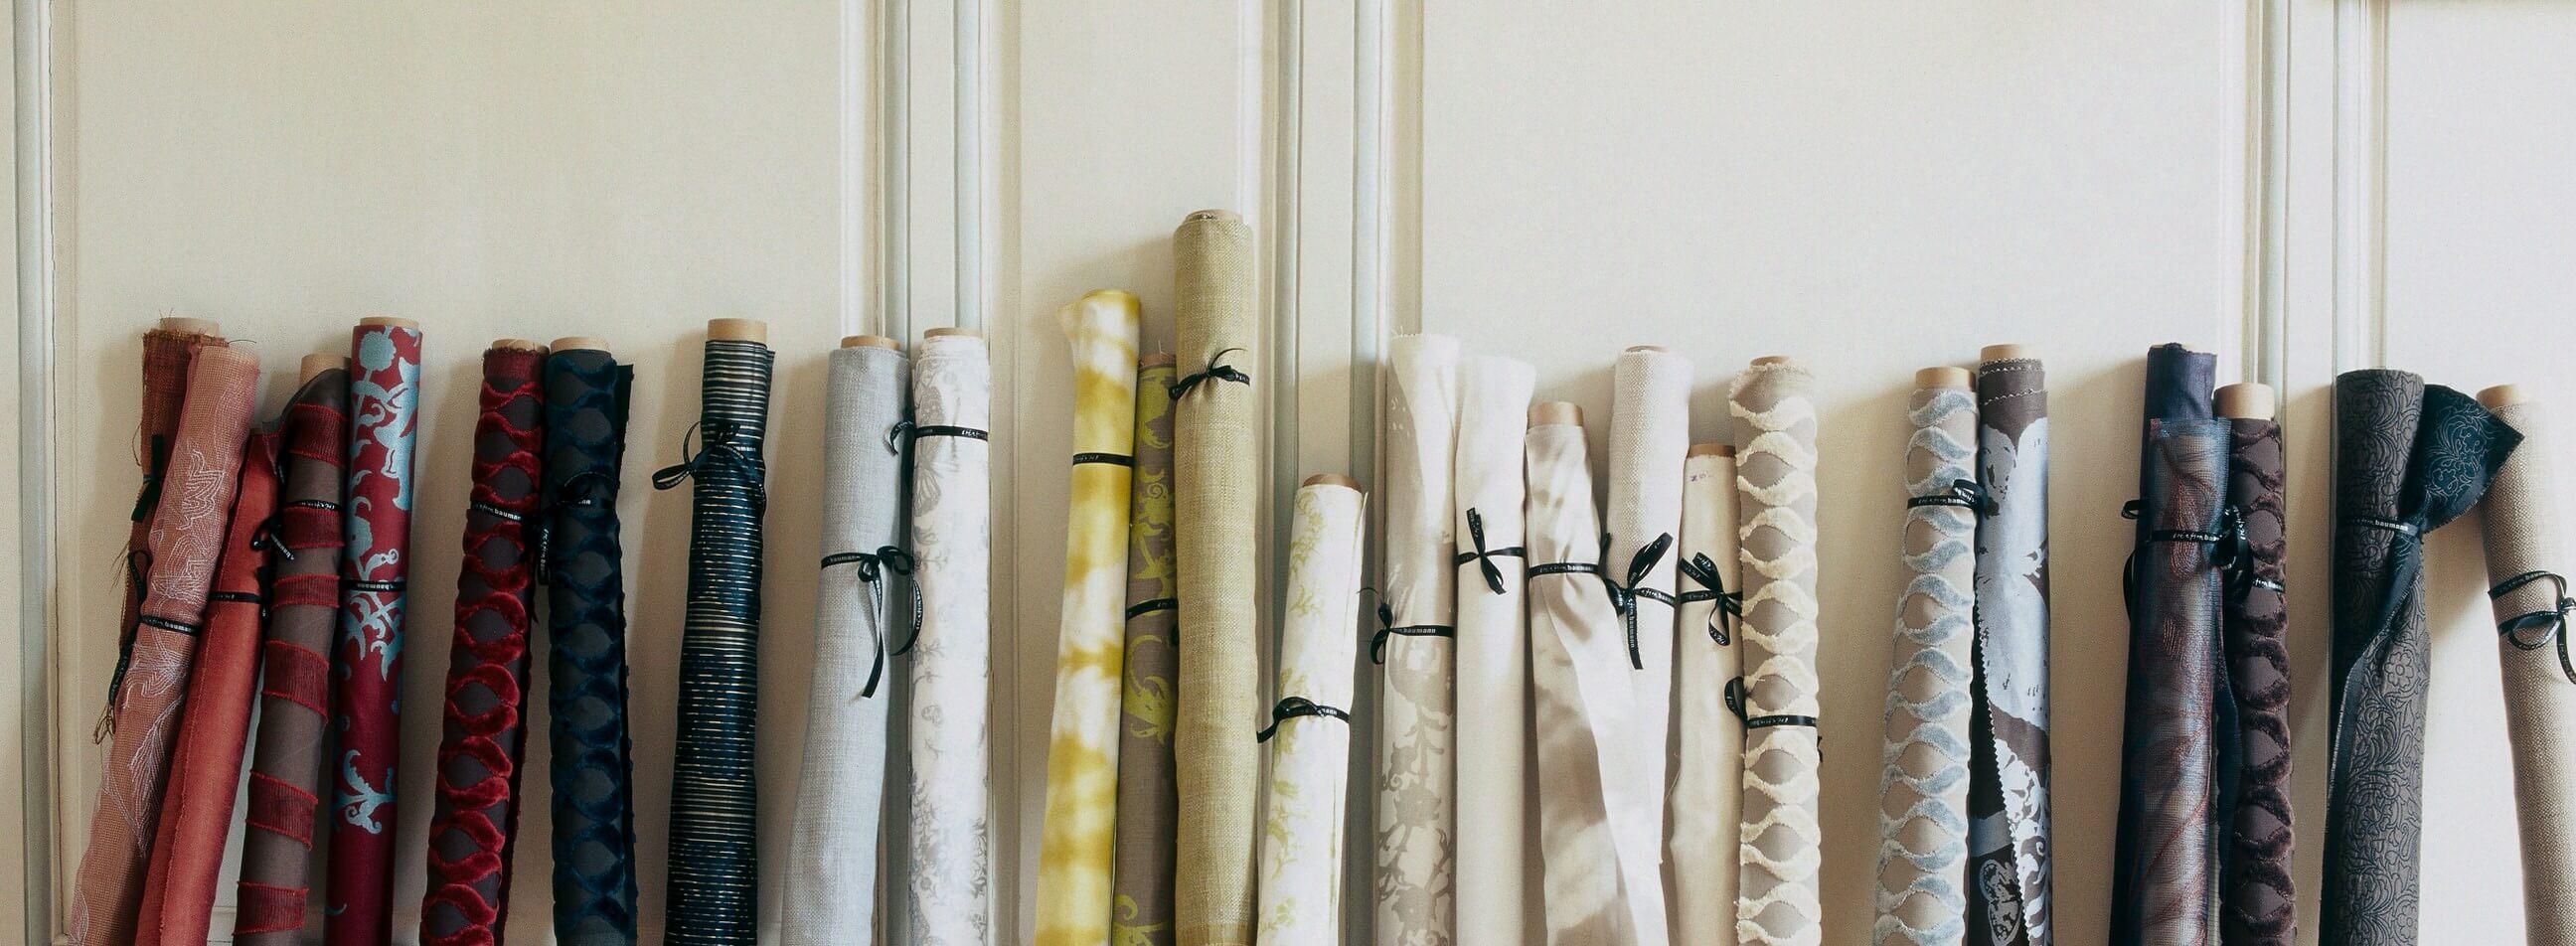 stoffe kaufen in berlin in riesiger auswahl bei adler wohndesign. Black Bedroom Furniture Sets. Home Design Ideas